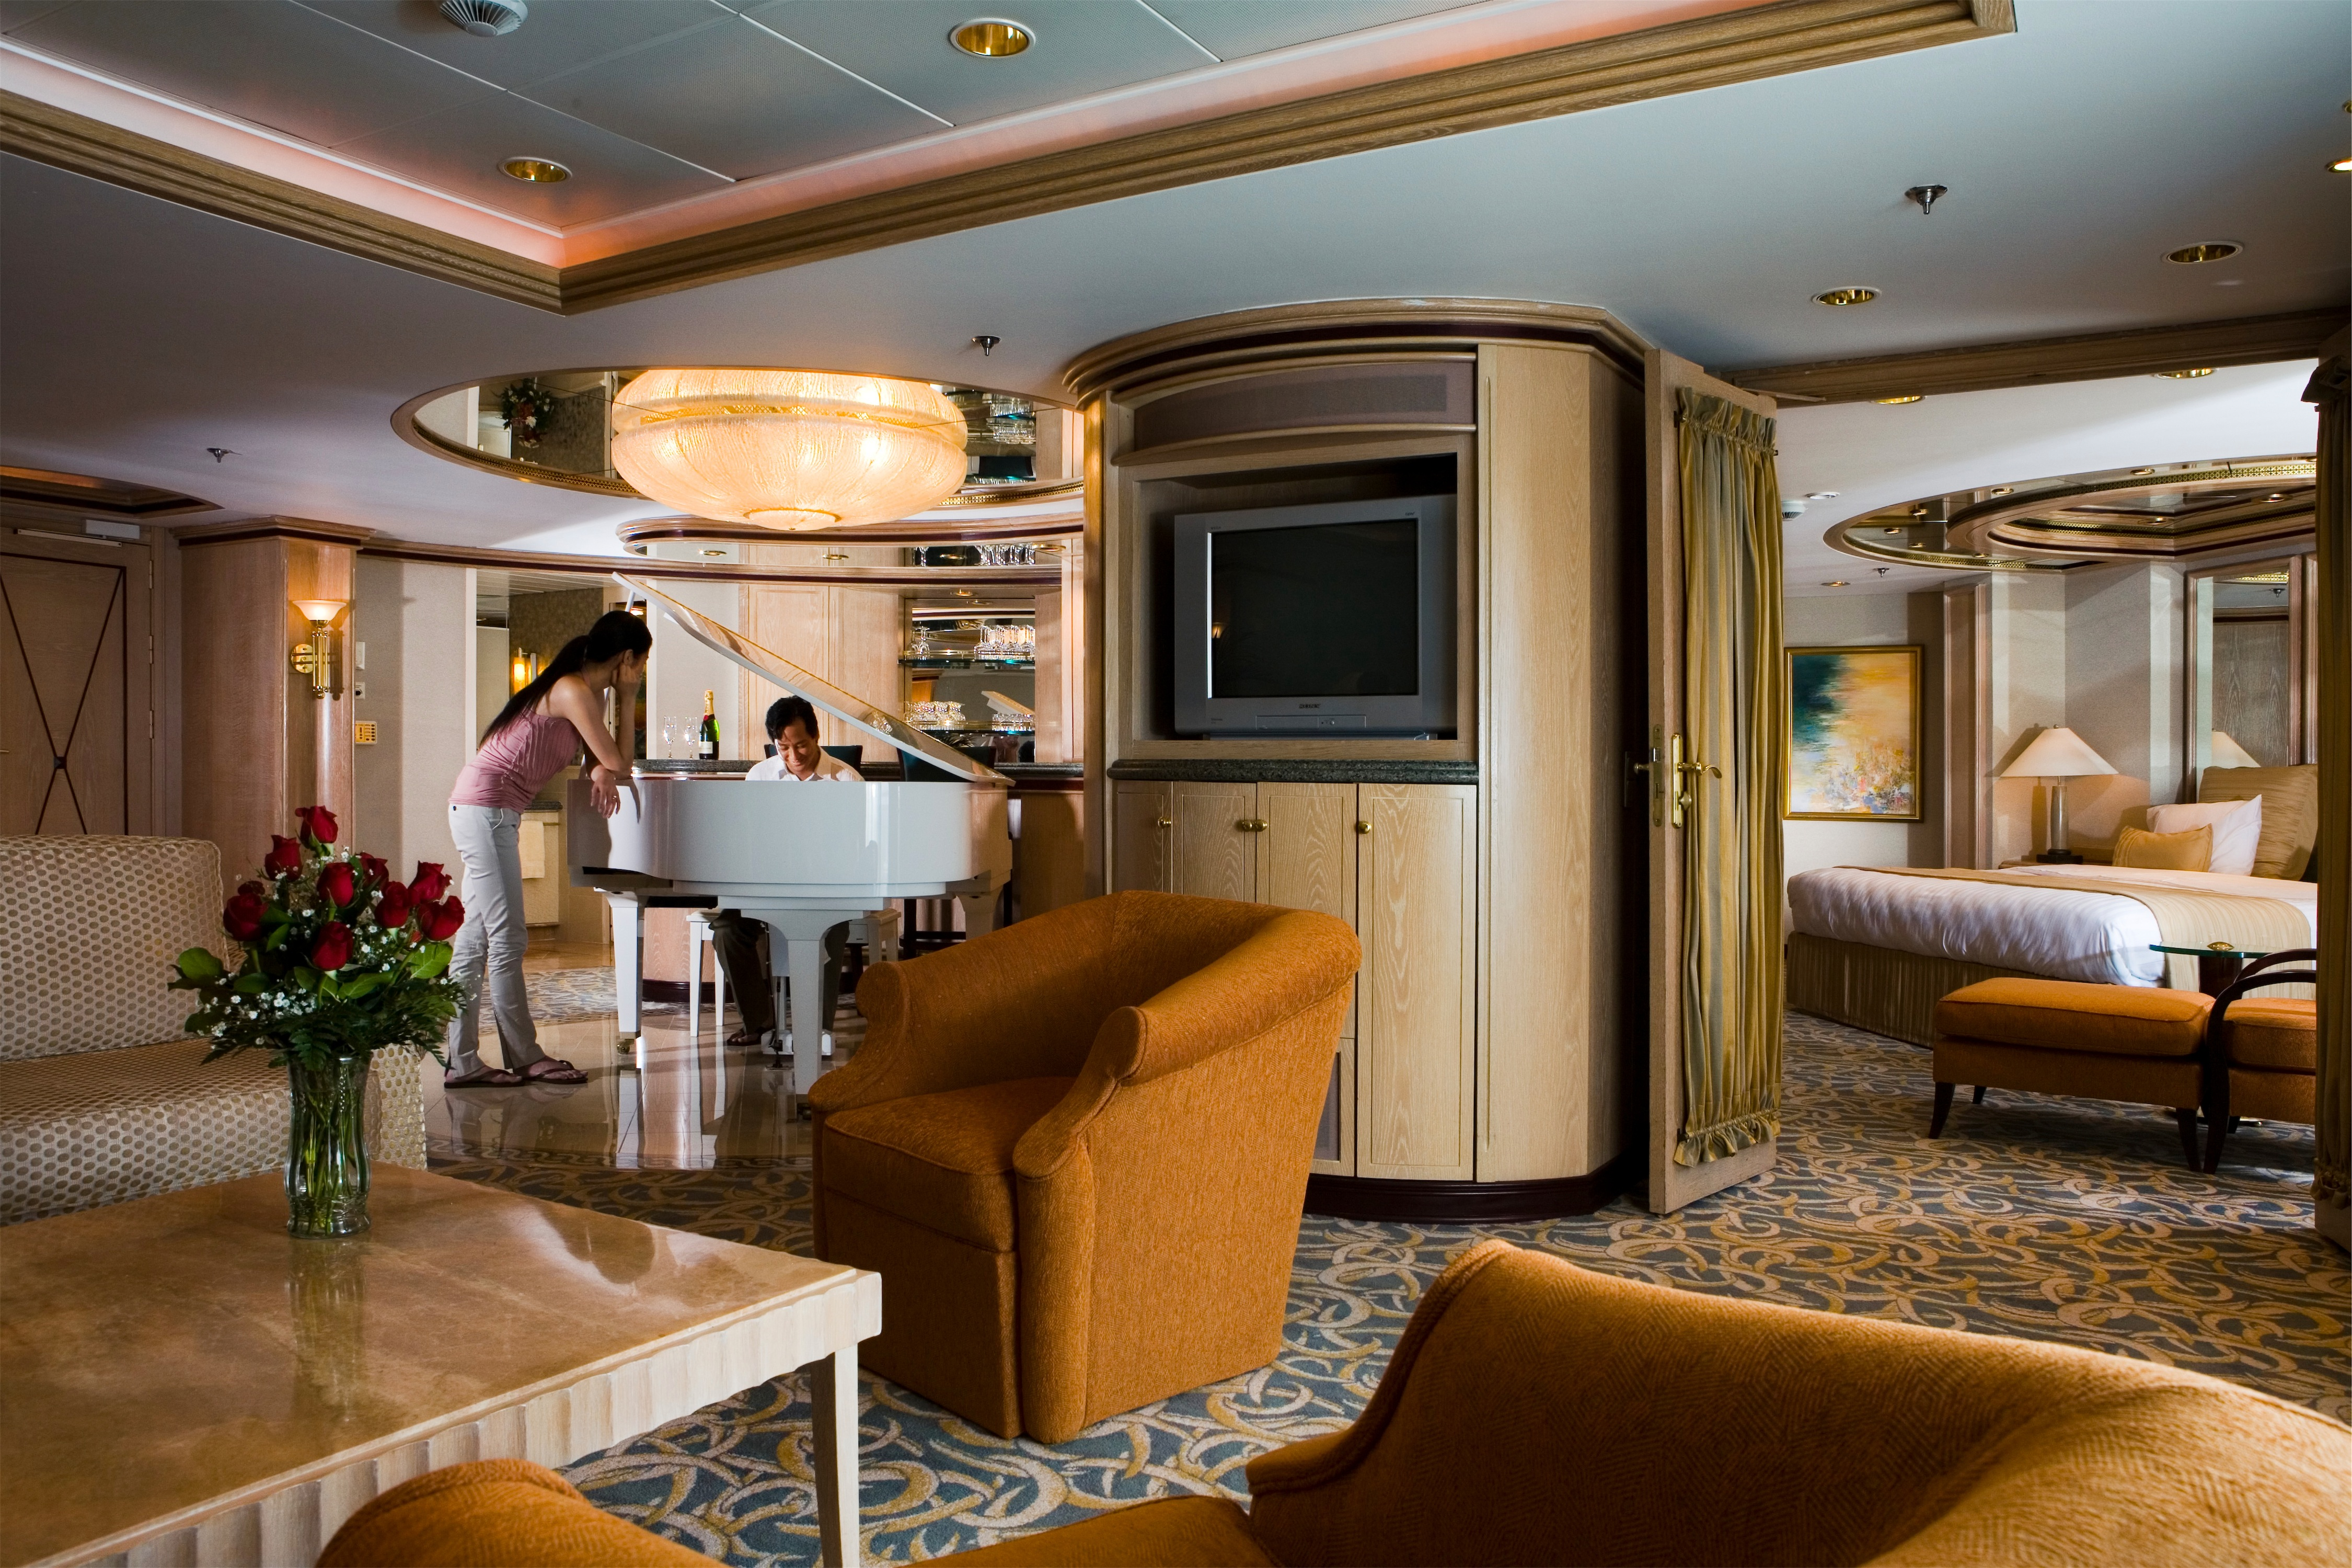 Royal Caribbean International Rhapsody of the Seas Accommodation Suite 3.jpg